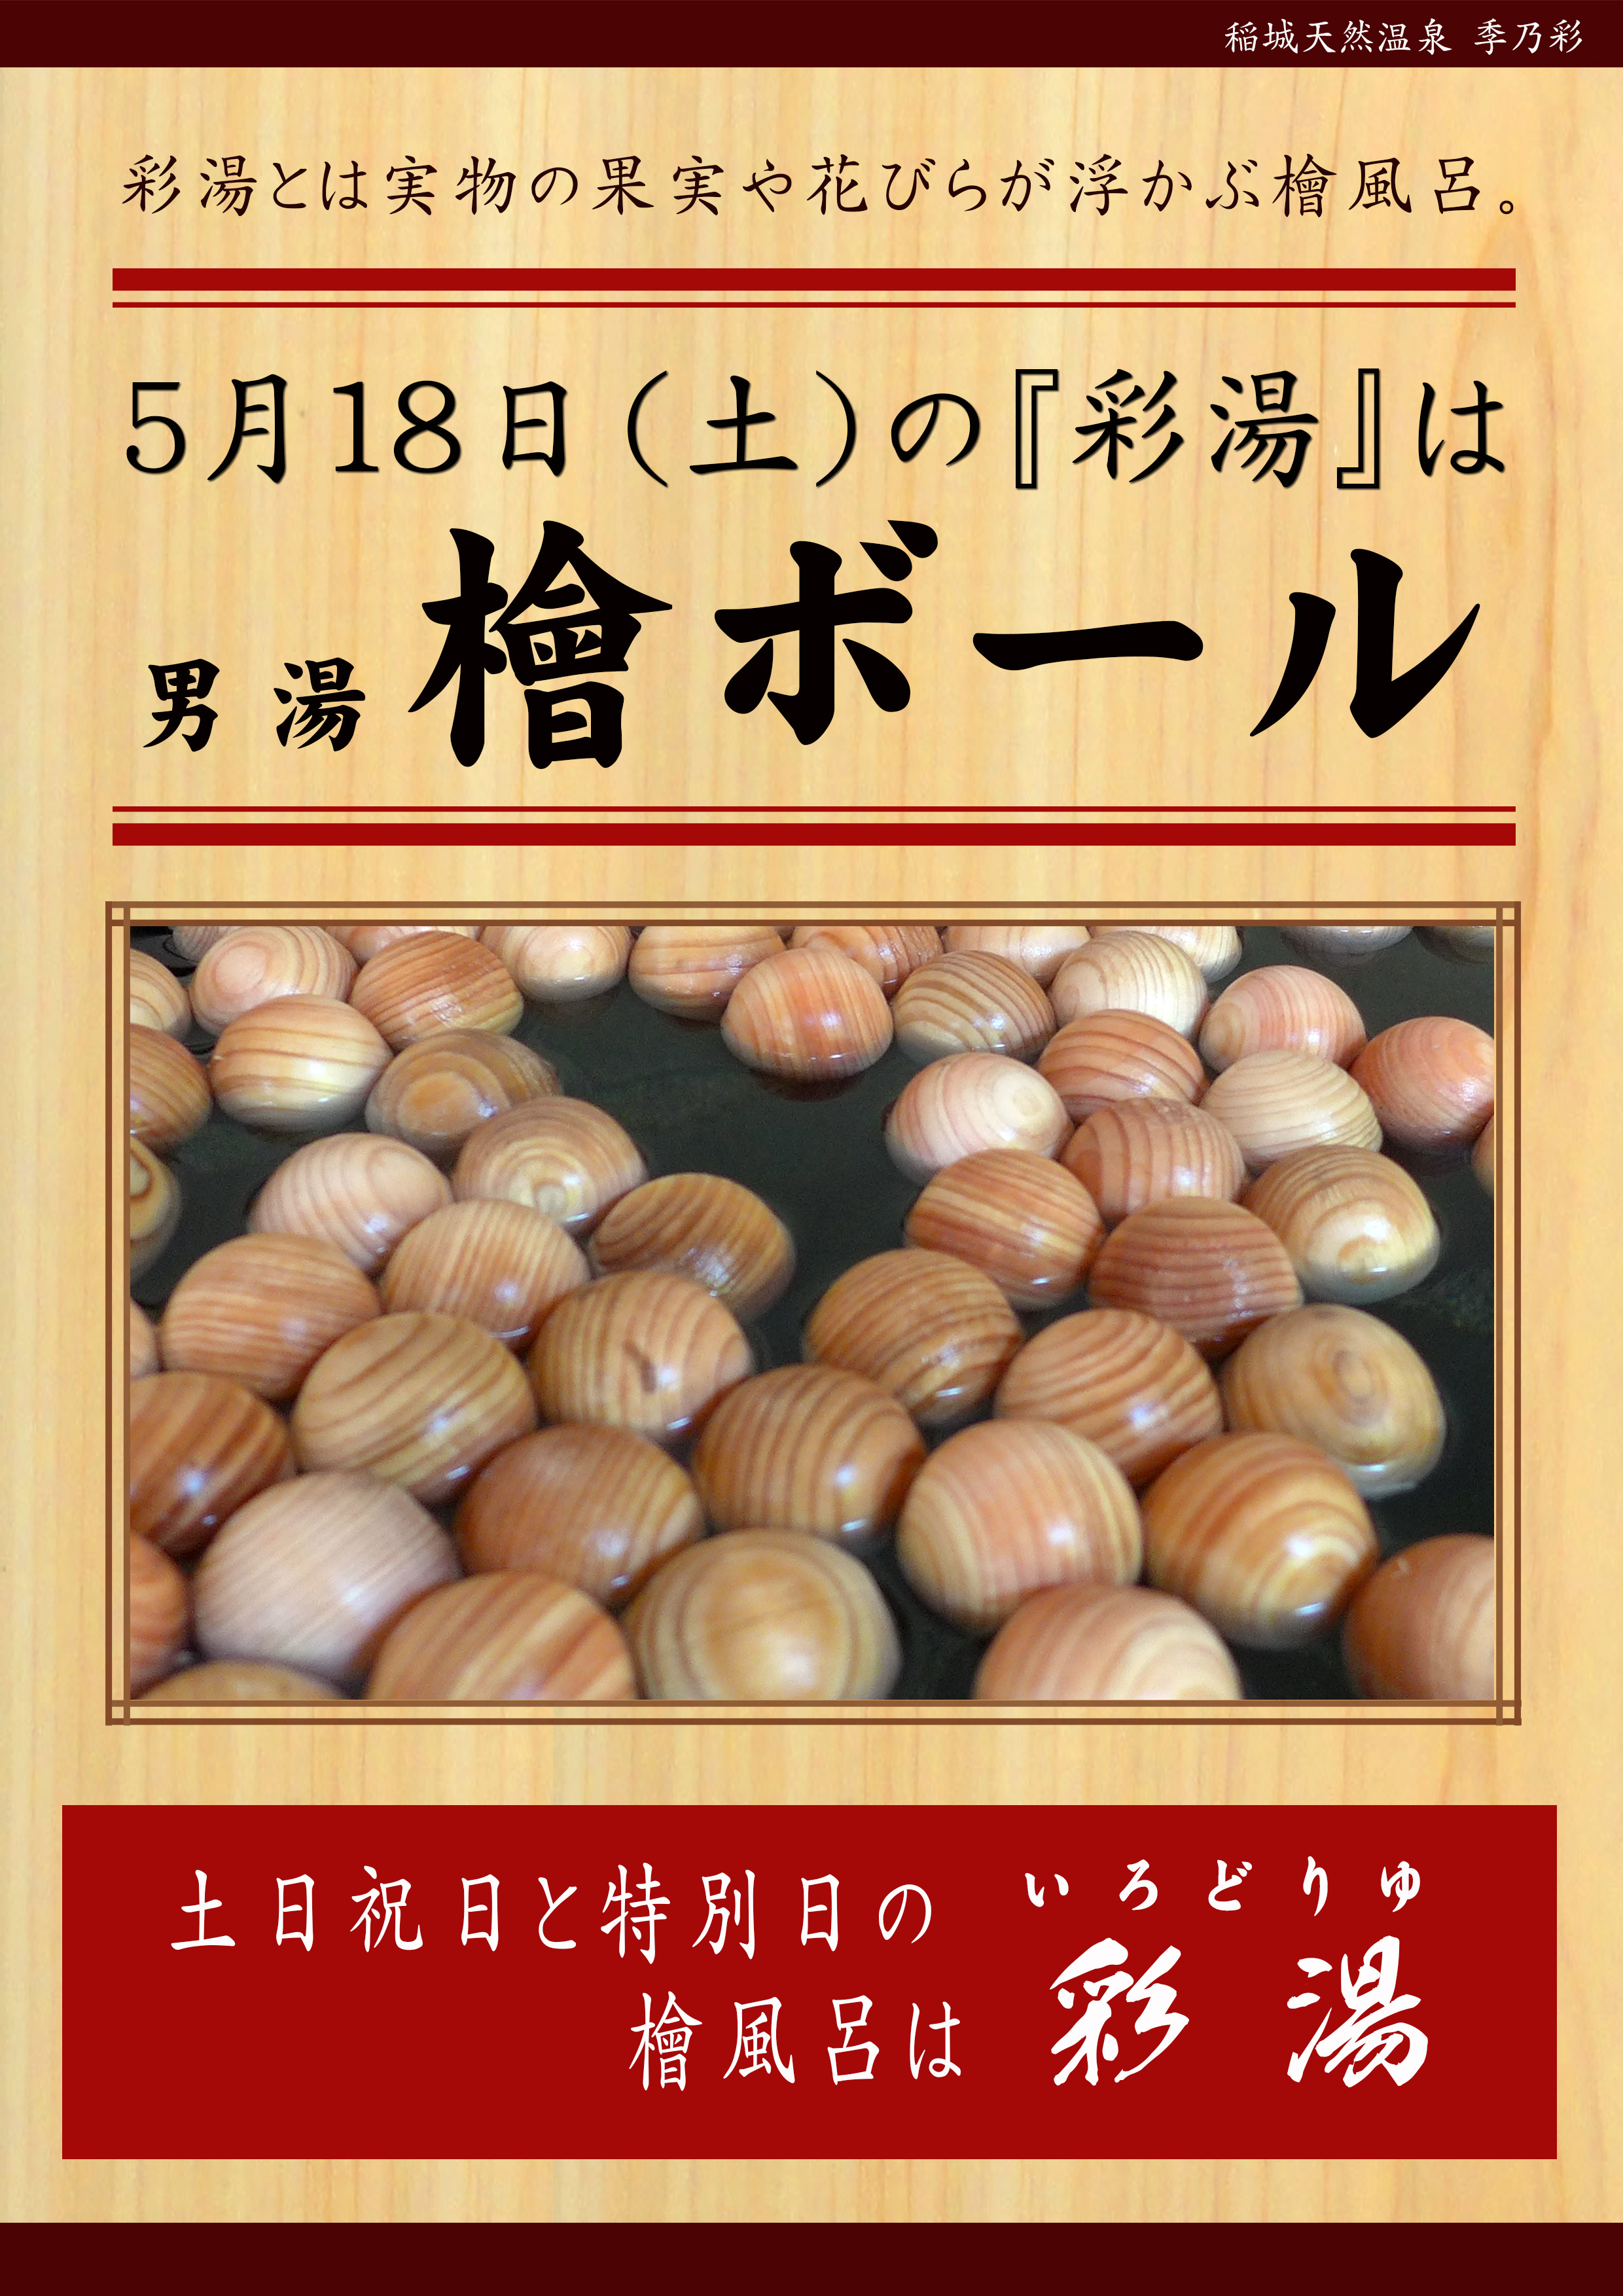 20190518POP イベント 彩湯 男湯 檜ボール